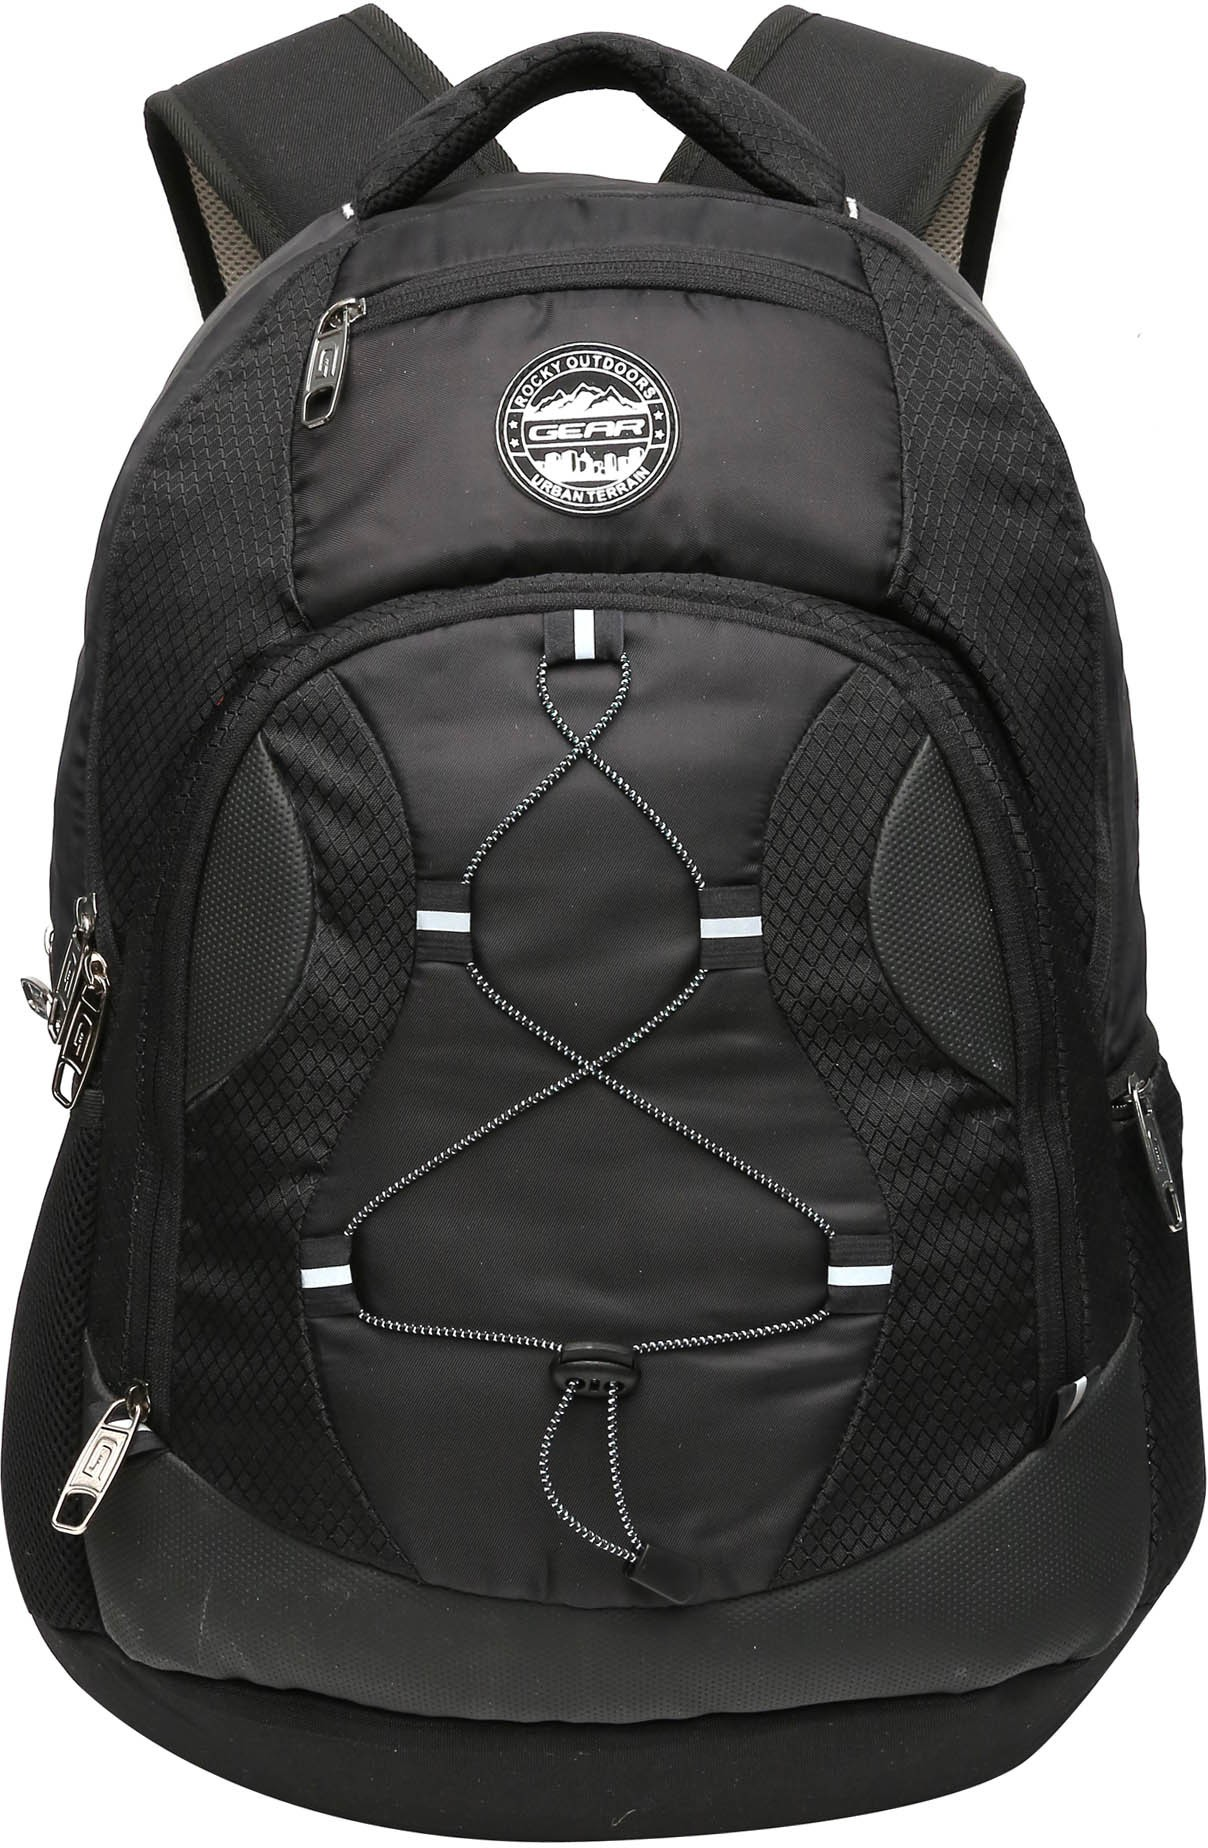 d39b3b3eb9 Gear lbpotlnr30109 Unisex Black Outlander 3 Waterproof Backpack ...